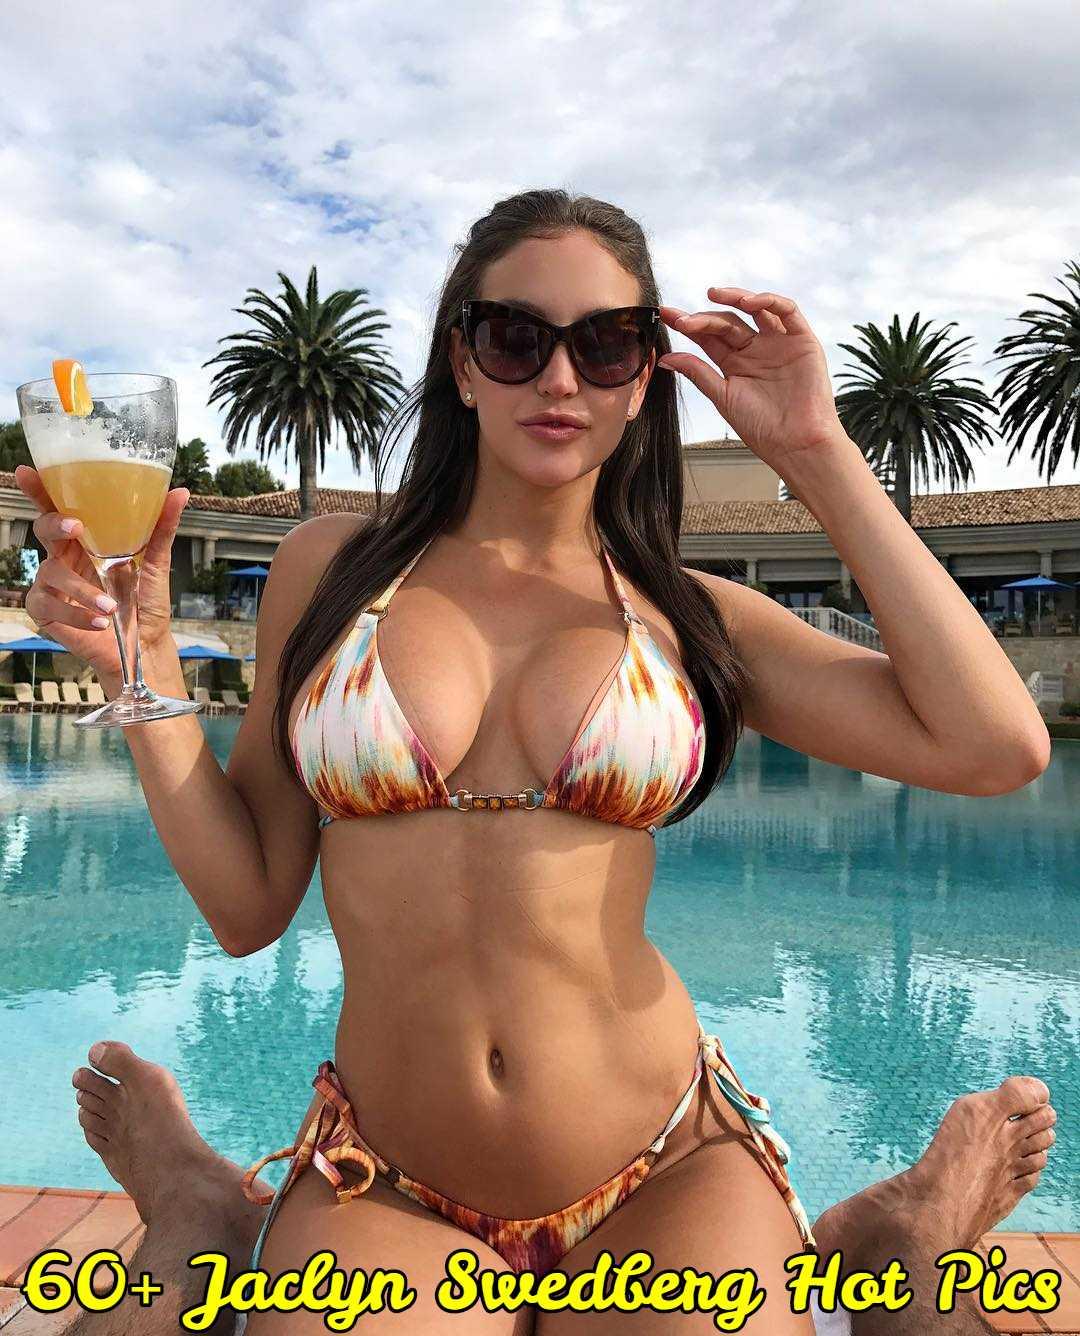 jaclyn swedberg hot pics